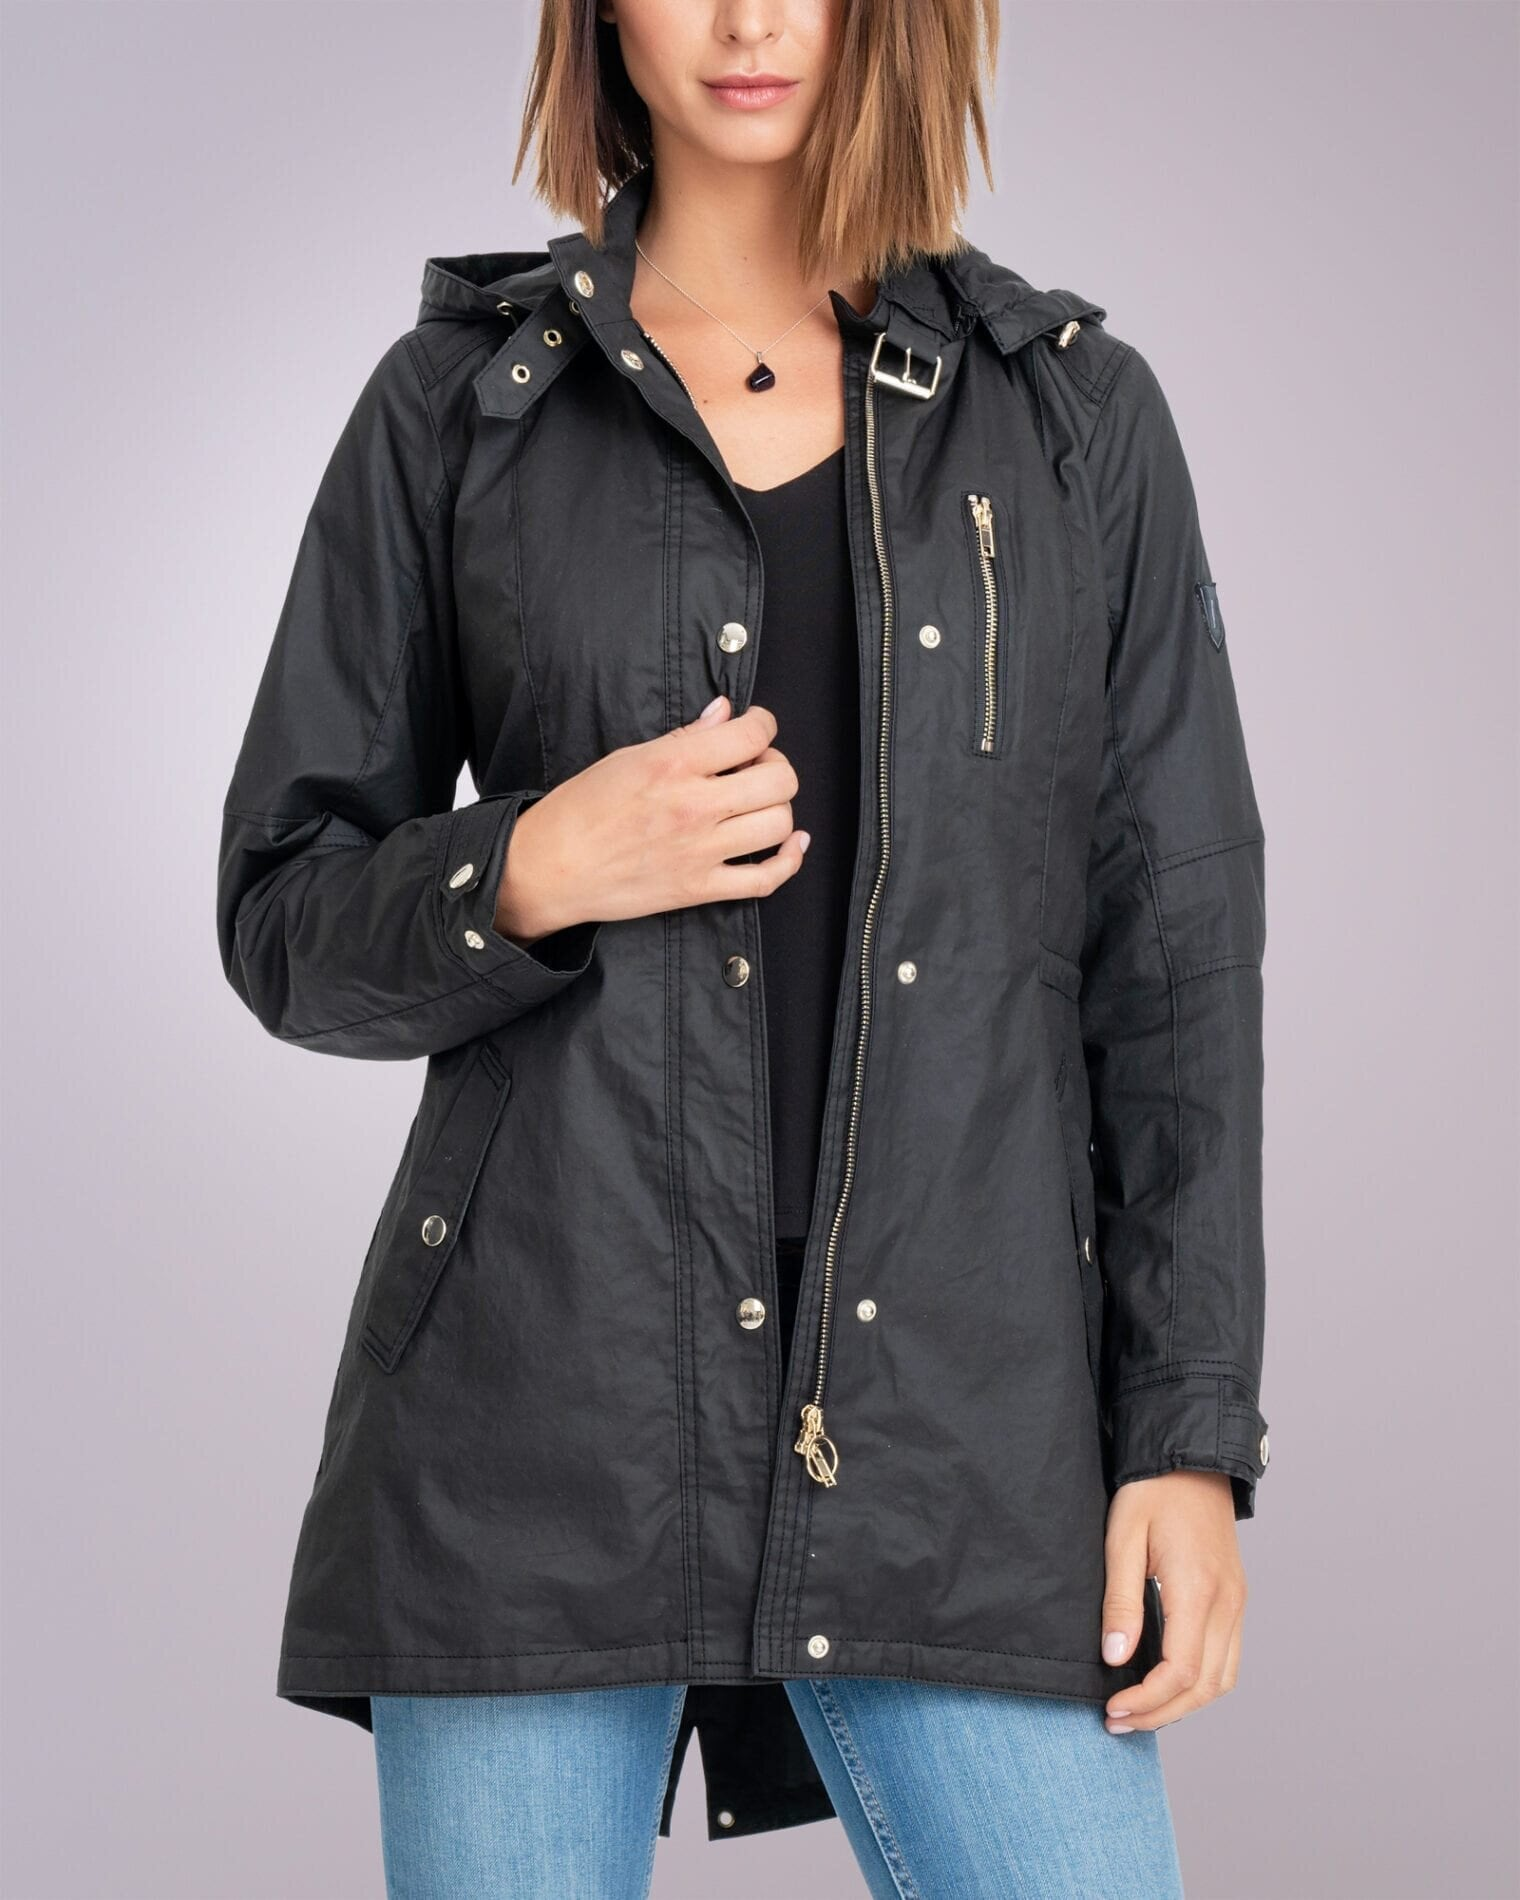 Hooded Canvas Jacket - Black